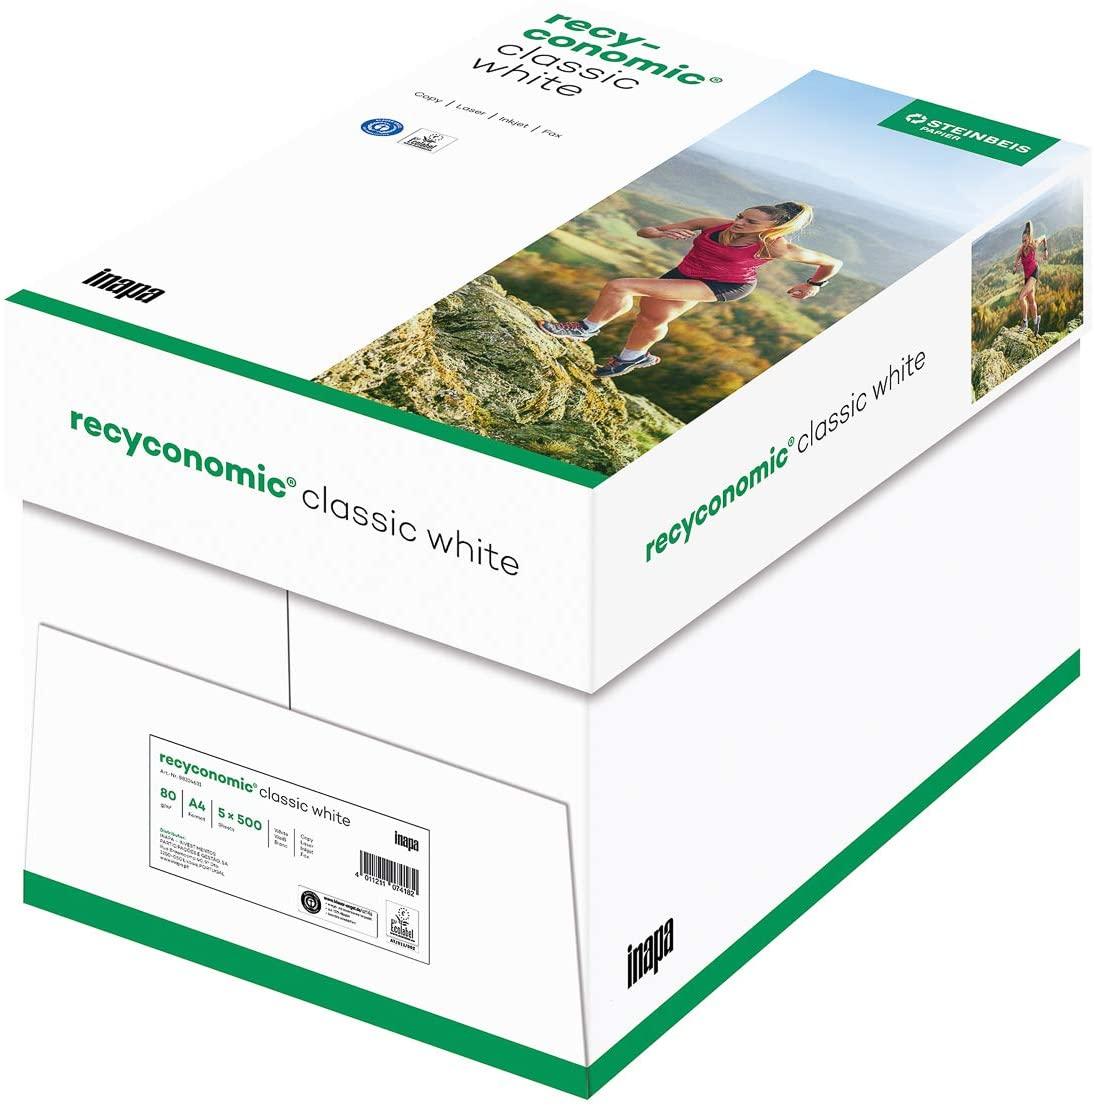 inapa Recycling-Druckerpapier Recyconomic ClassicWhite, 80g, A4, CIE-Weiße: 55 (recycling-grau), 250